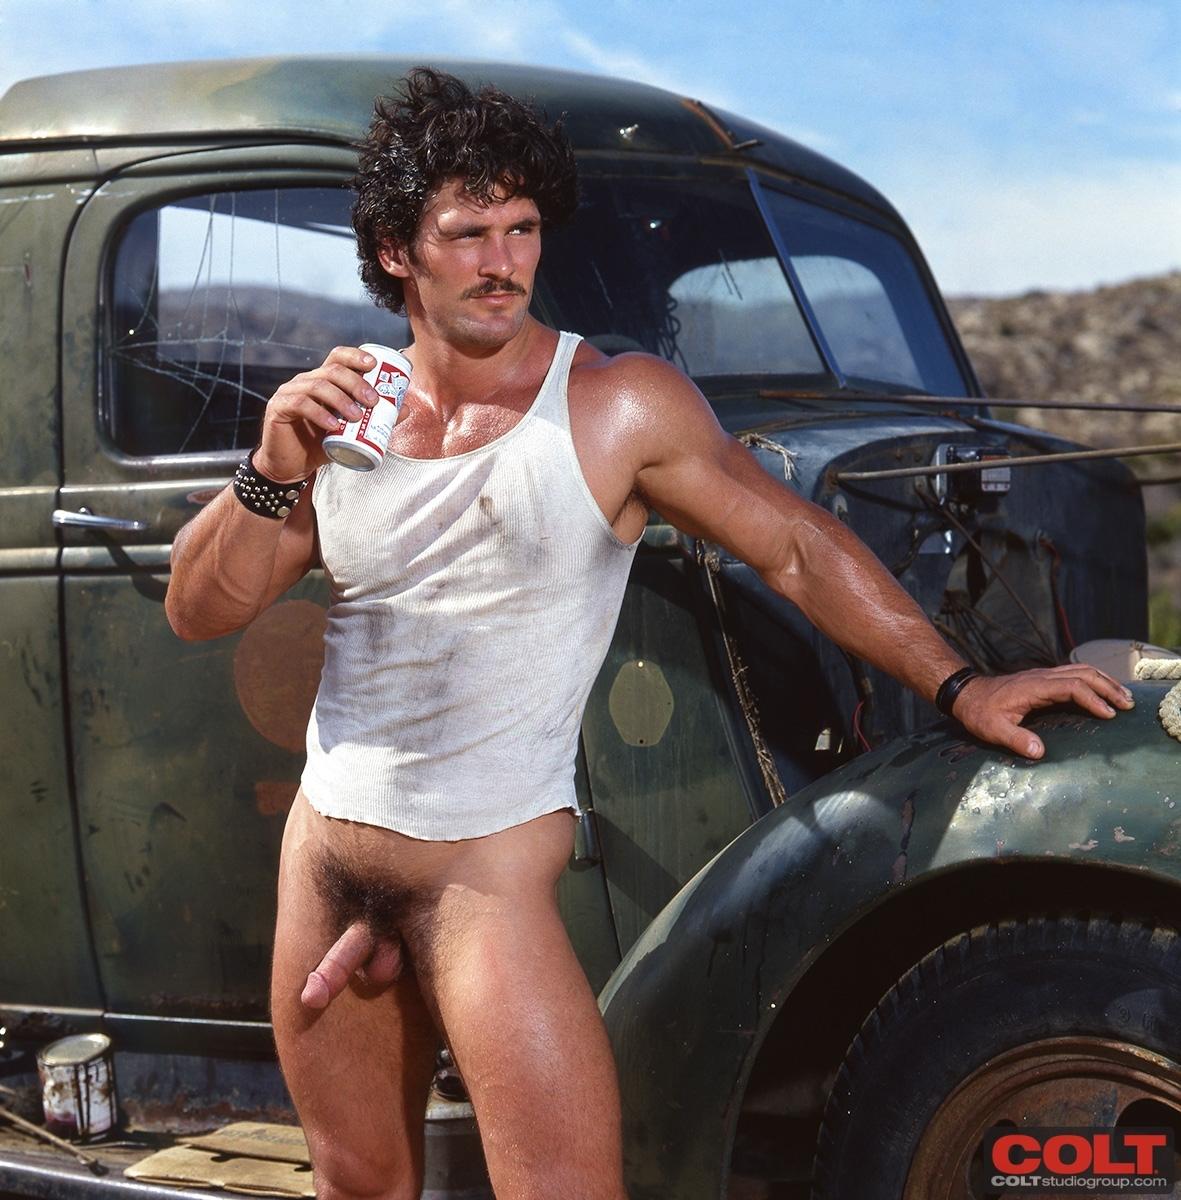 Sam Dekker Colt gay hot daddy porn